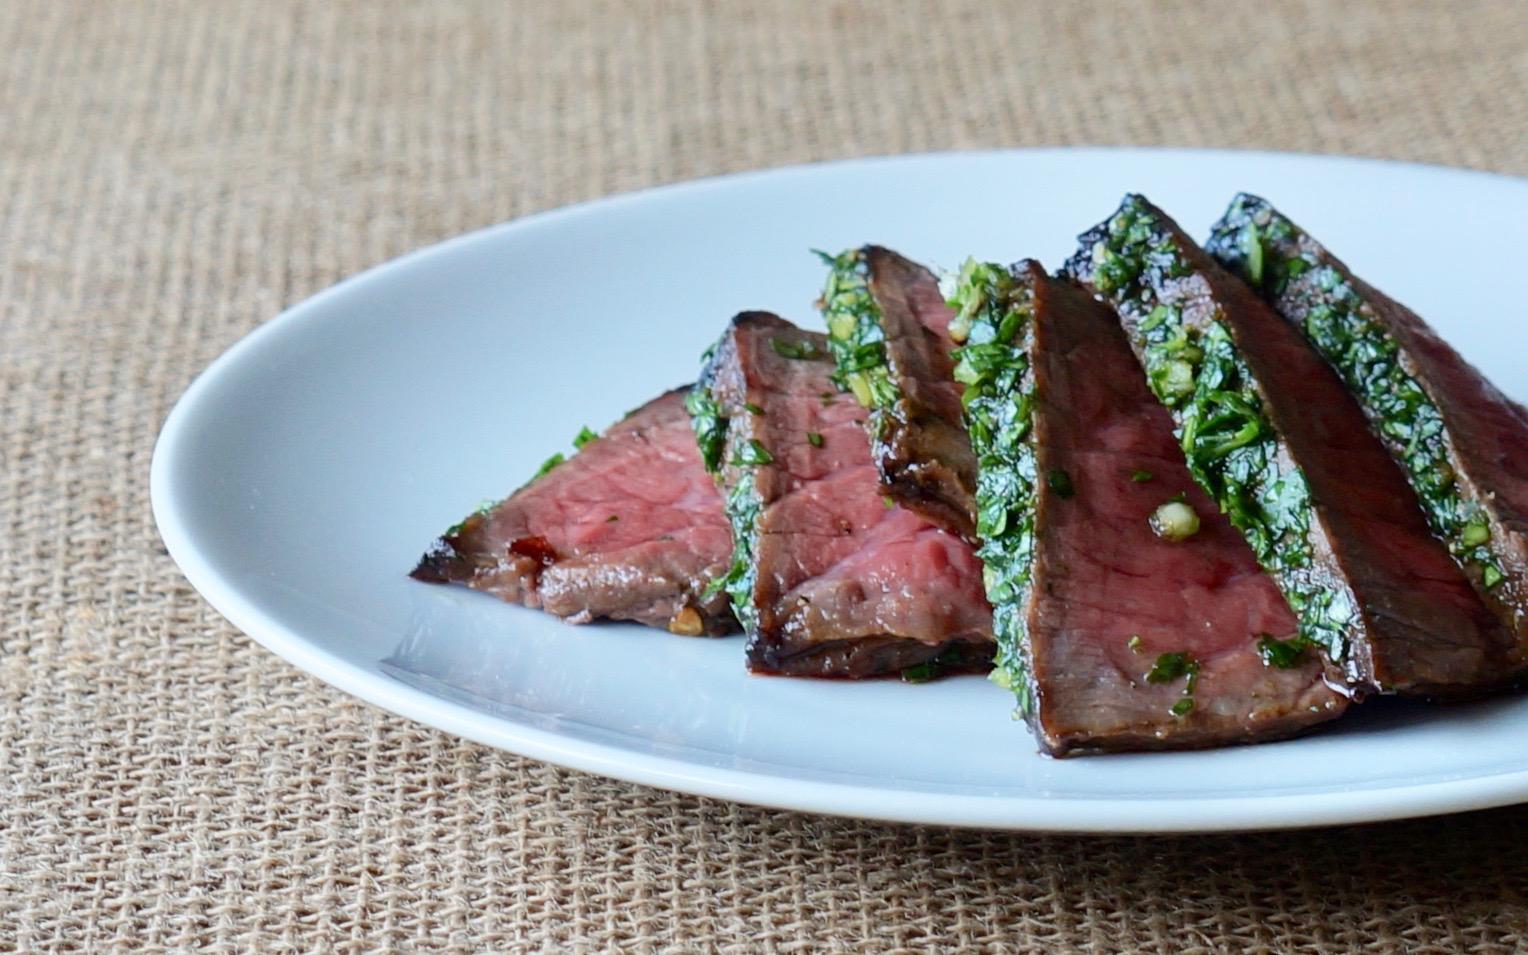 Parsley-Garlic-London-Broil-Top-Round-Steak-Rebecca-Gordon-Editor-In-Chief Buttermilk-Lipstick-Culinary Entertaining Techniques-RebeccaGordon-Southern-Hostess-Pastry-Chef-Birmingham-Alabama